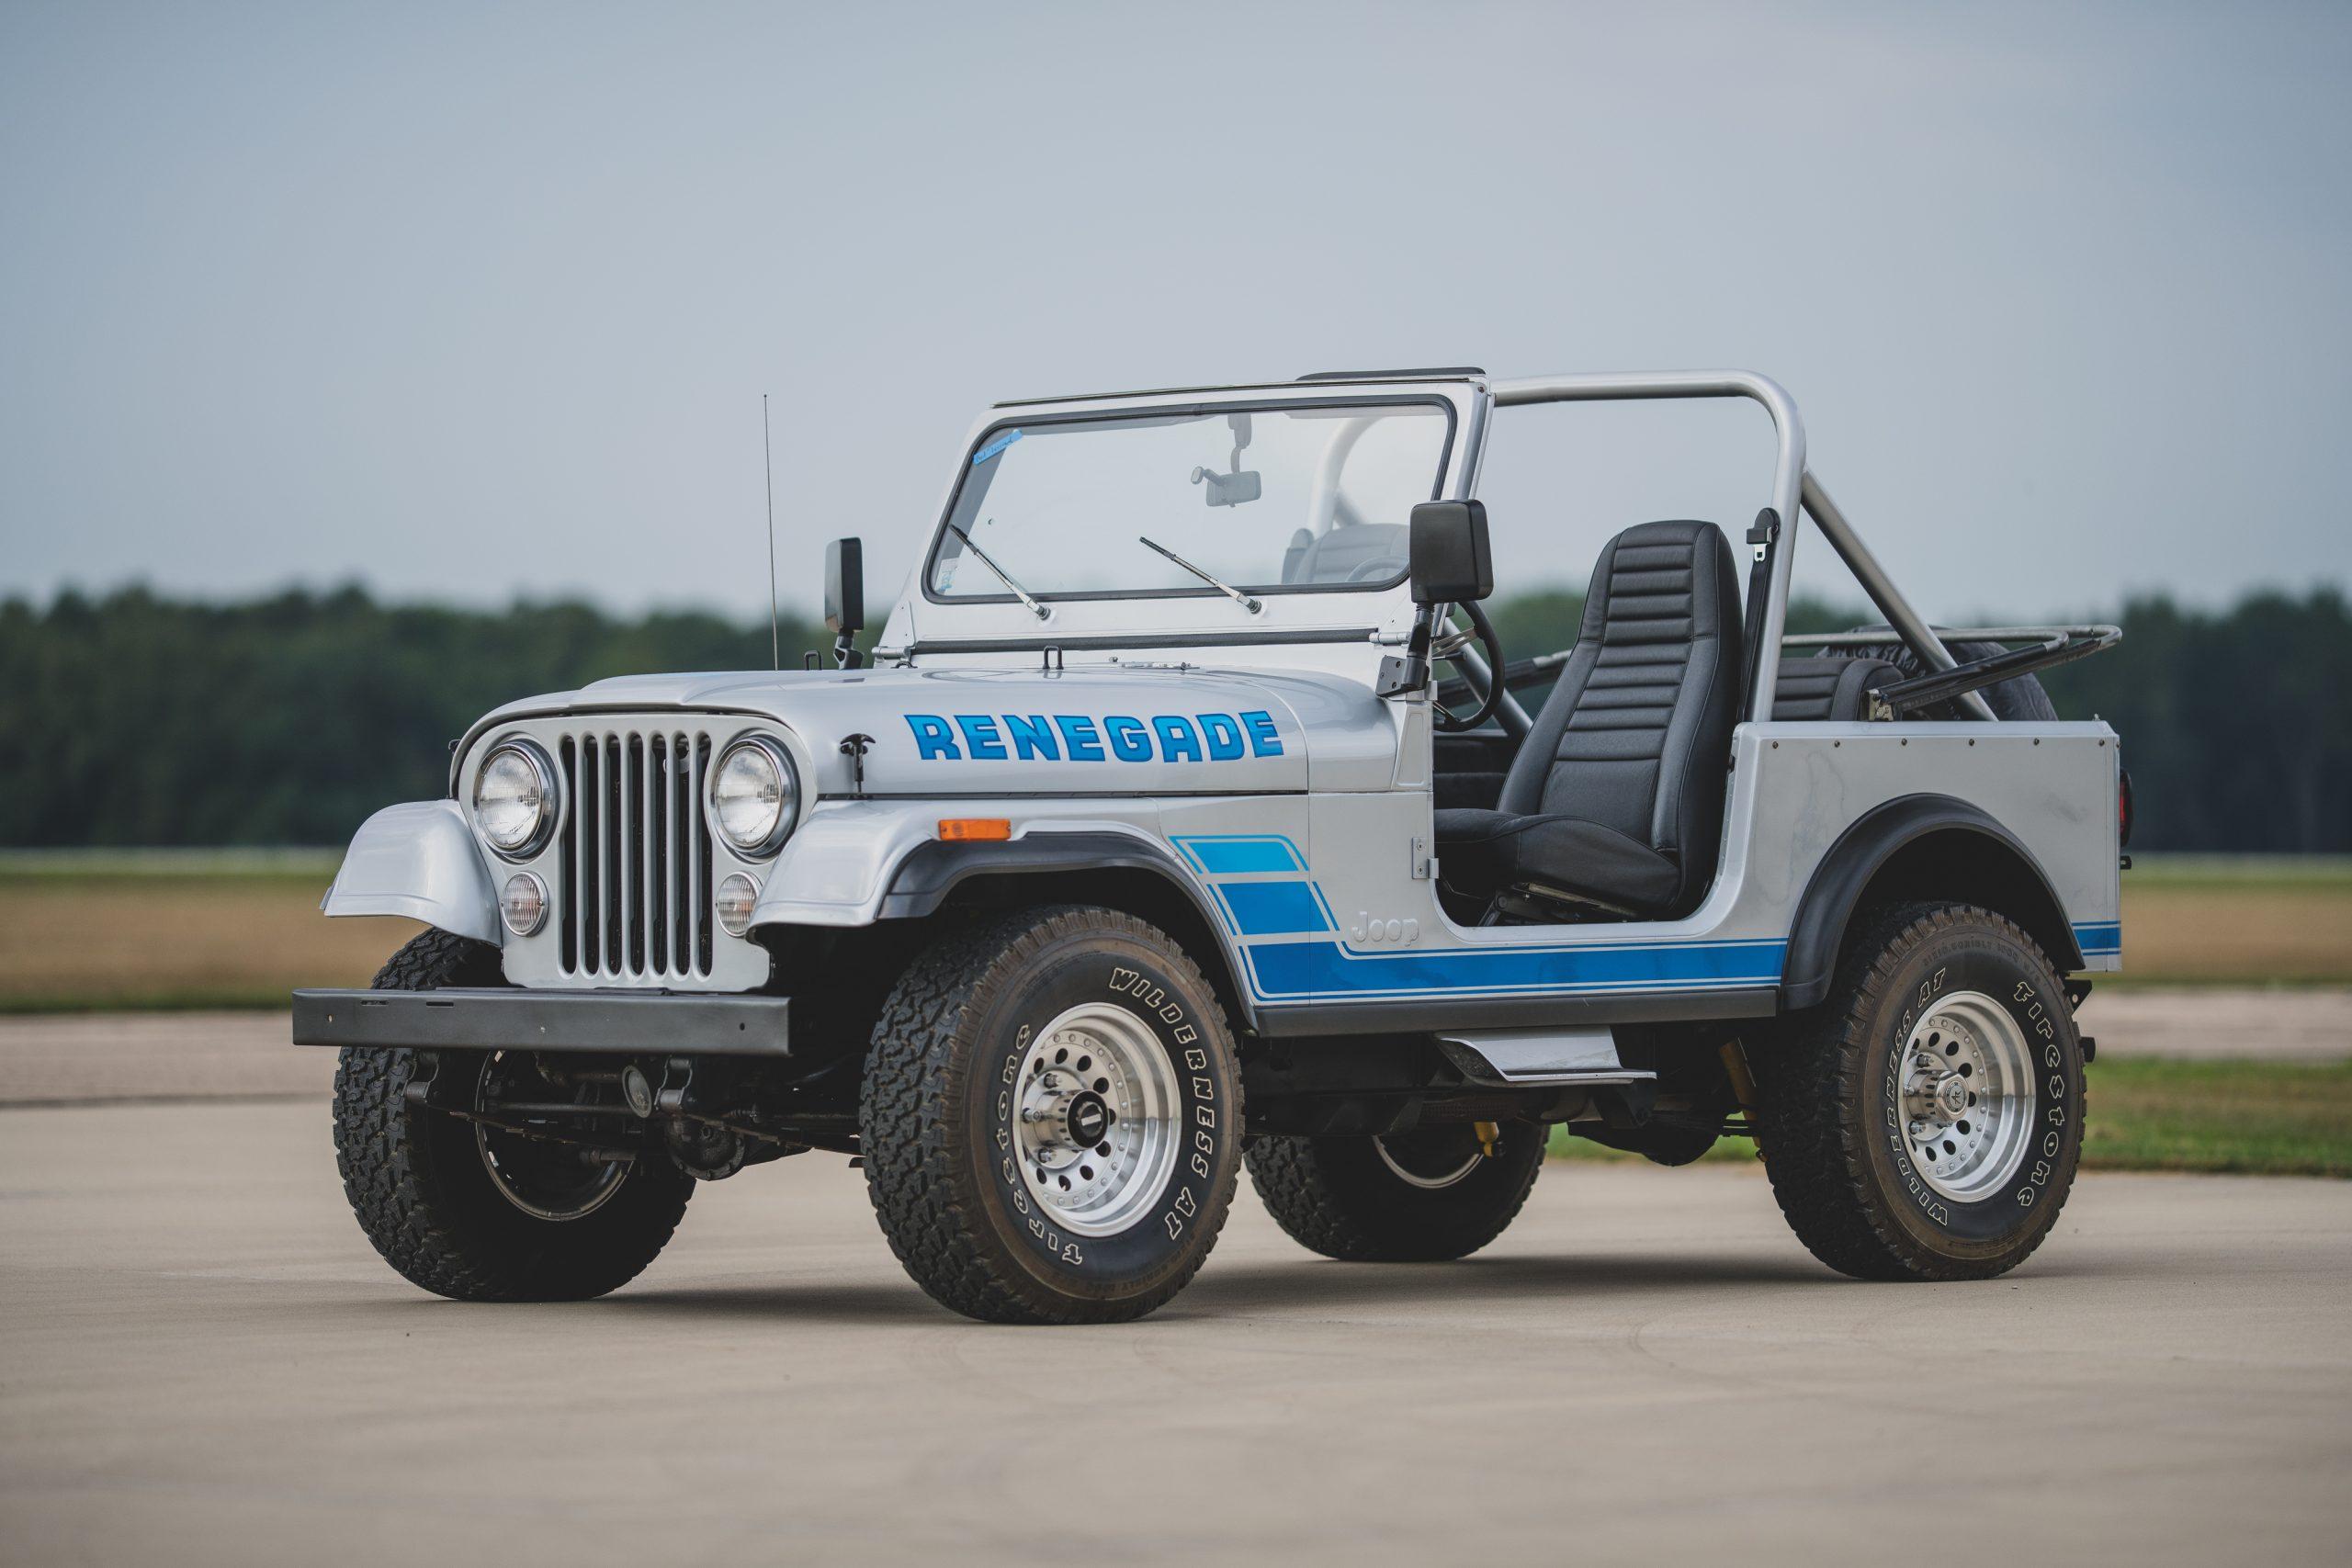 Jeep CJ7 Renegade front three-quarter